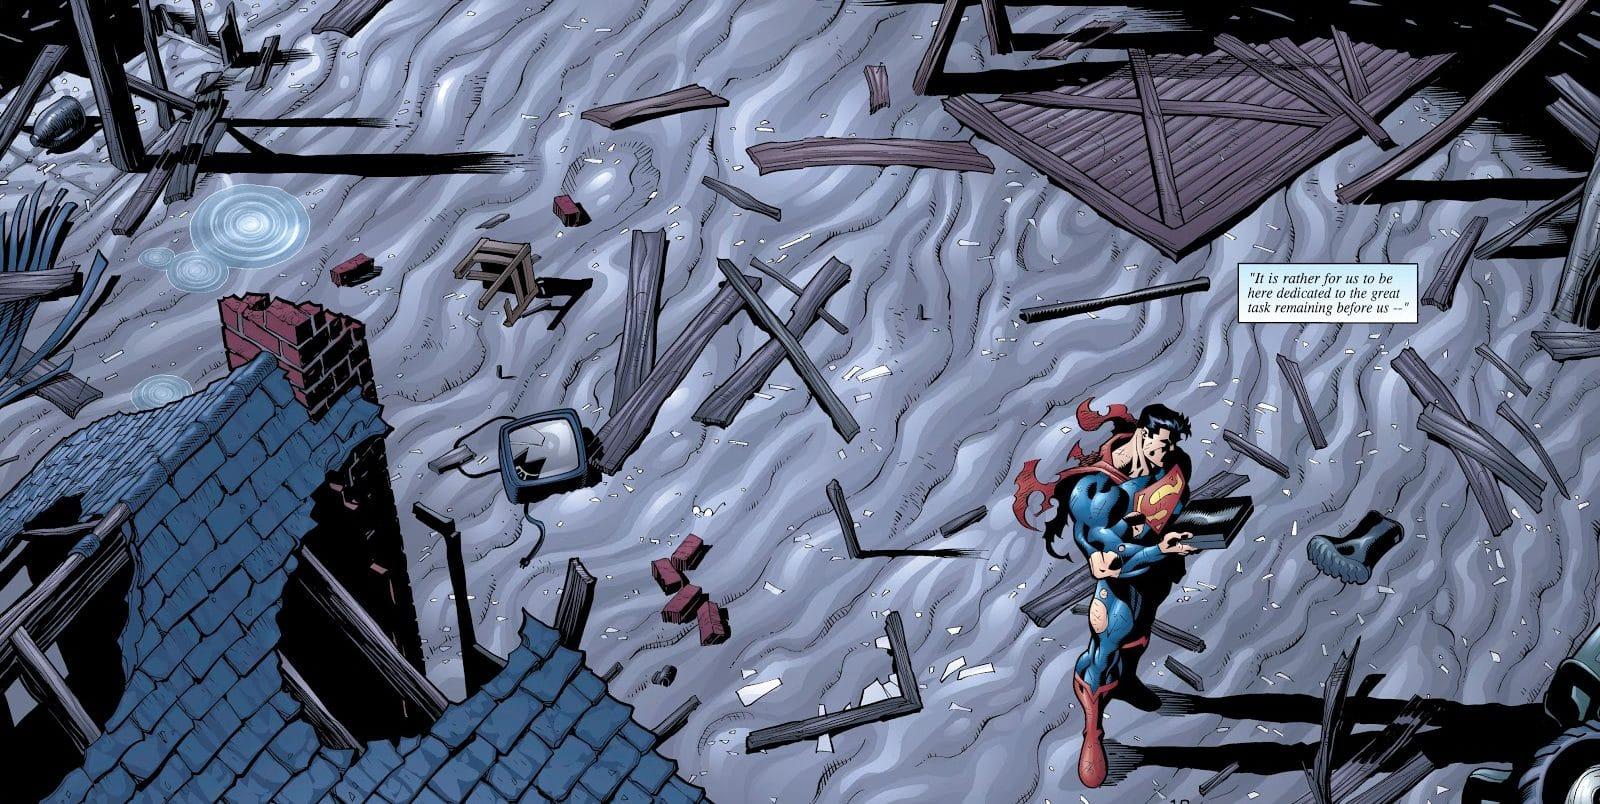 superman new metropolis t3 image2